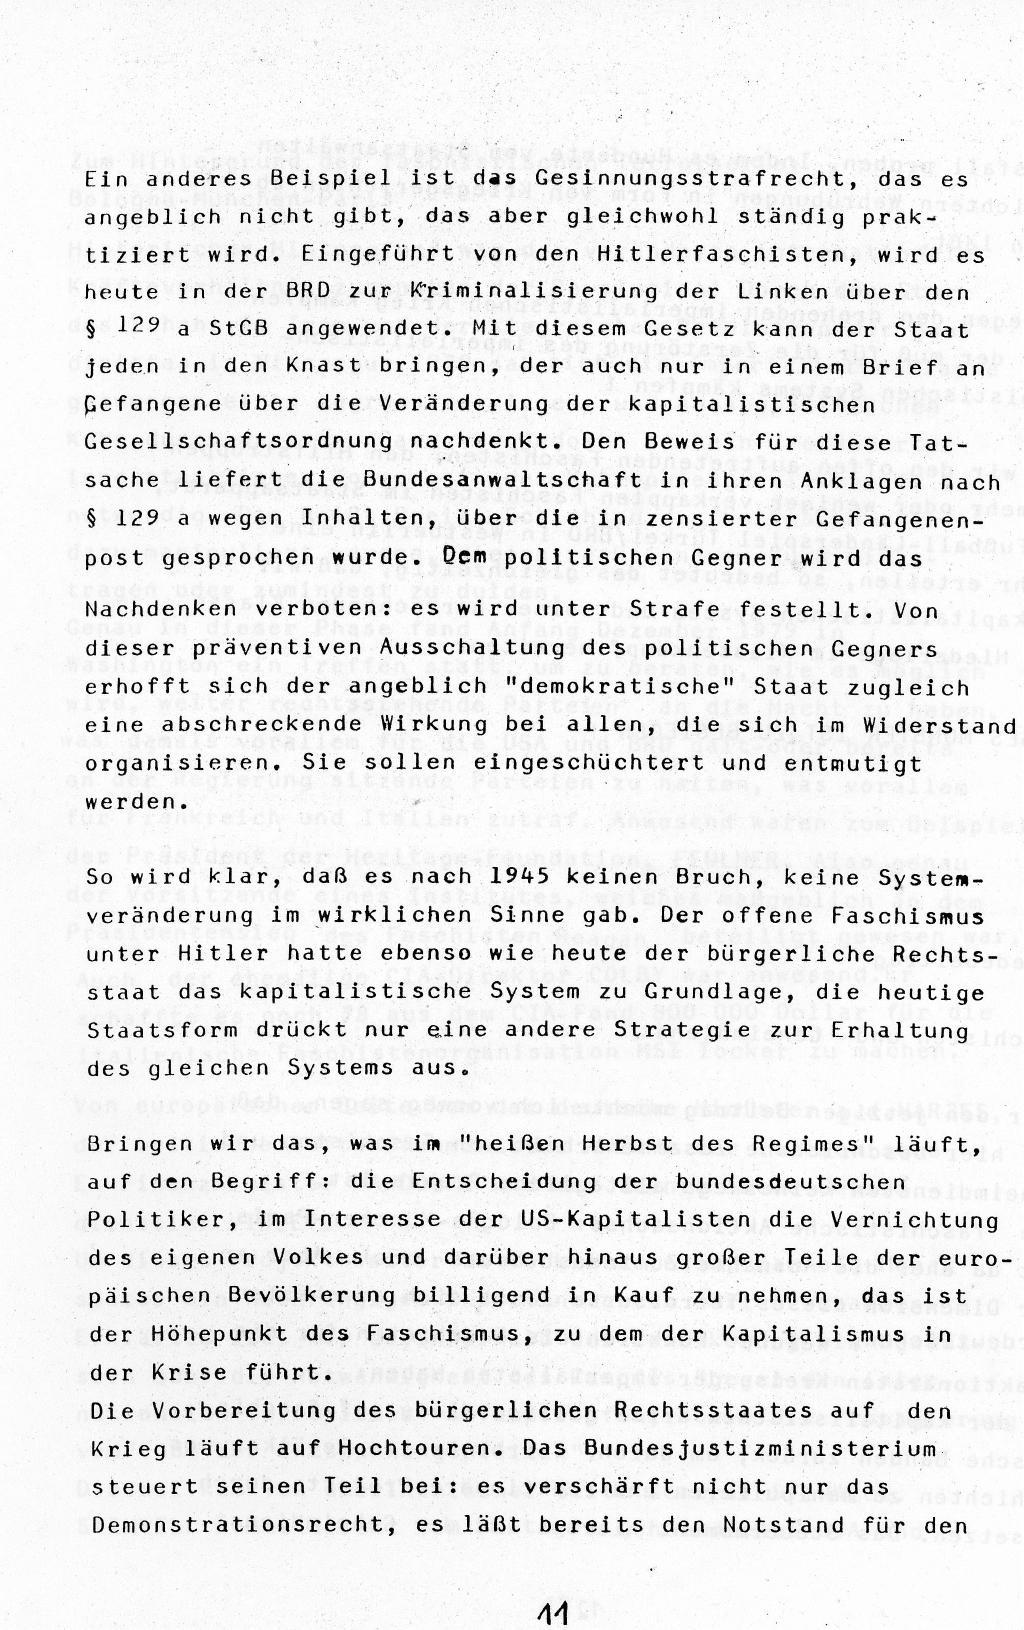 Berlin_1983_Autonome_Gruppen_Faschismus_im_Kapitalismus_11